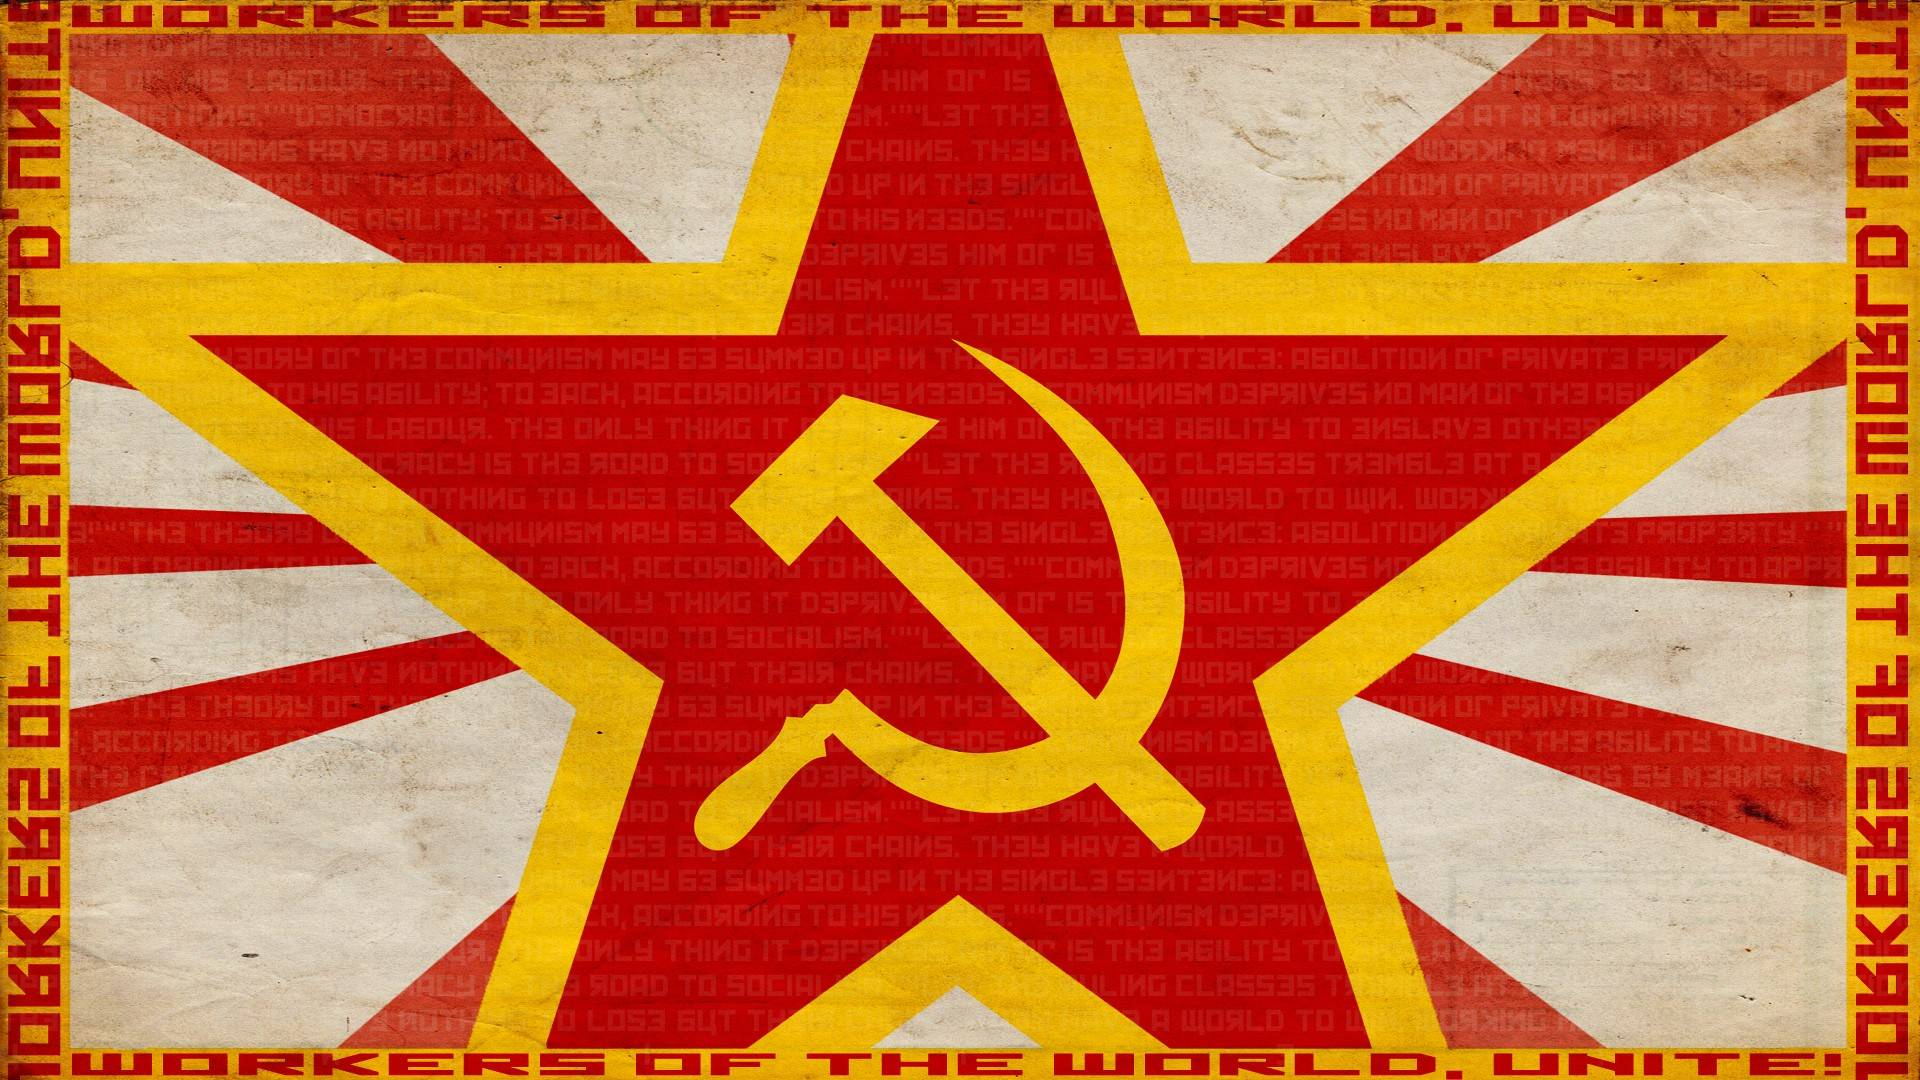 Soviet Wallpapers - Wallpaper Cave